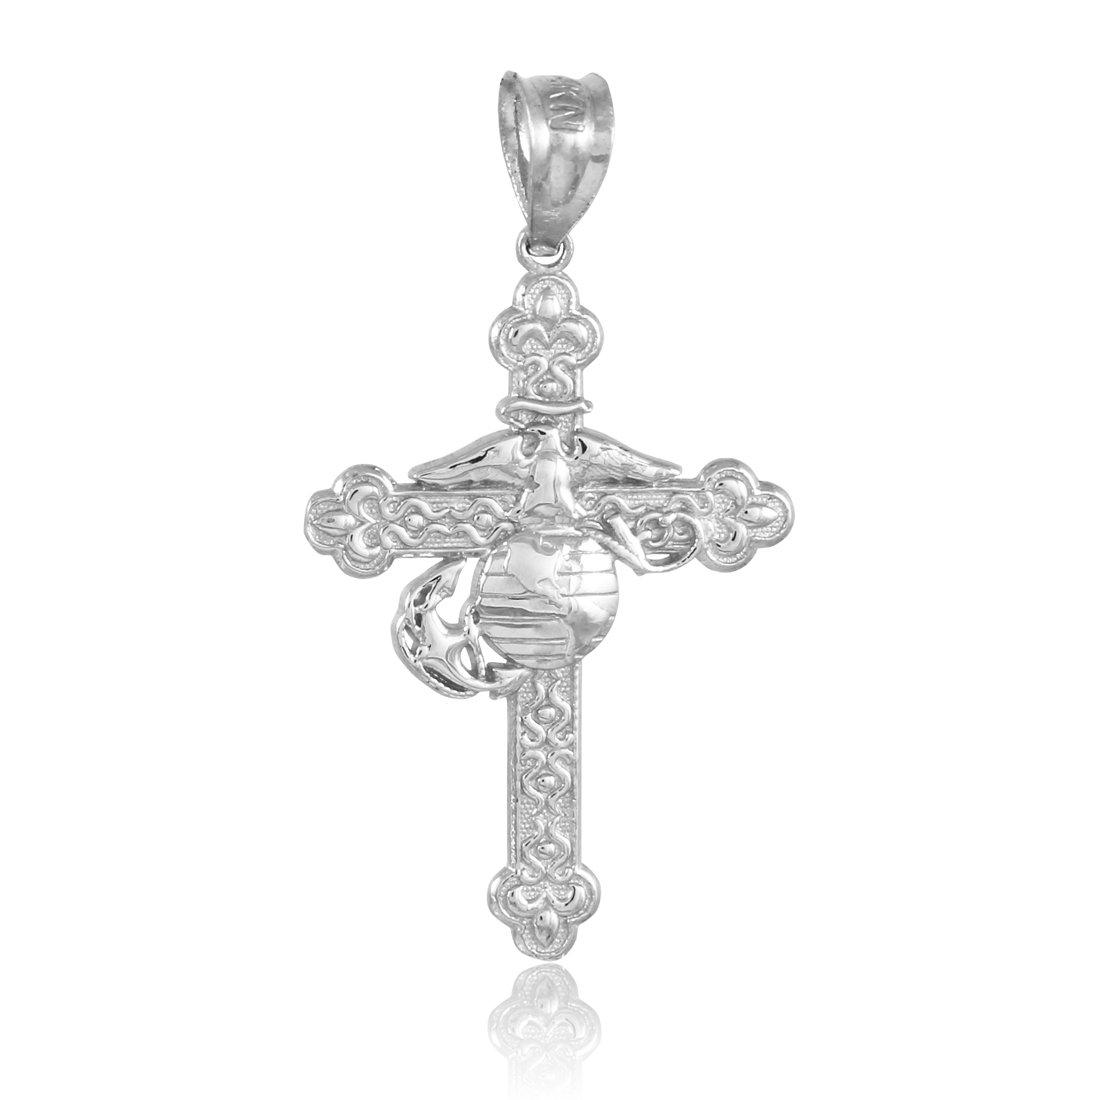 Silver US Marine Christian Cross Charm Pendant Necklace, ocean, boath, sea